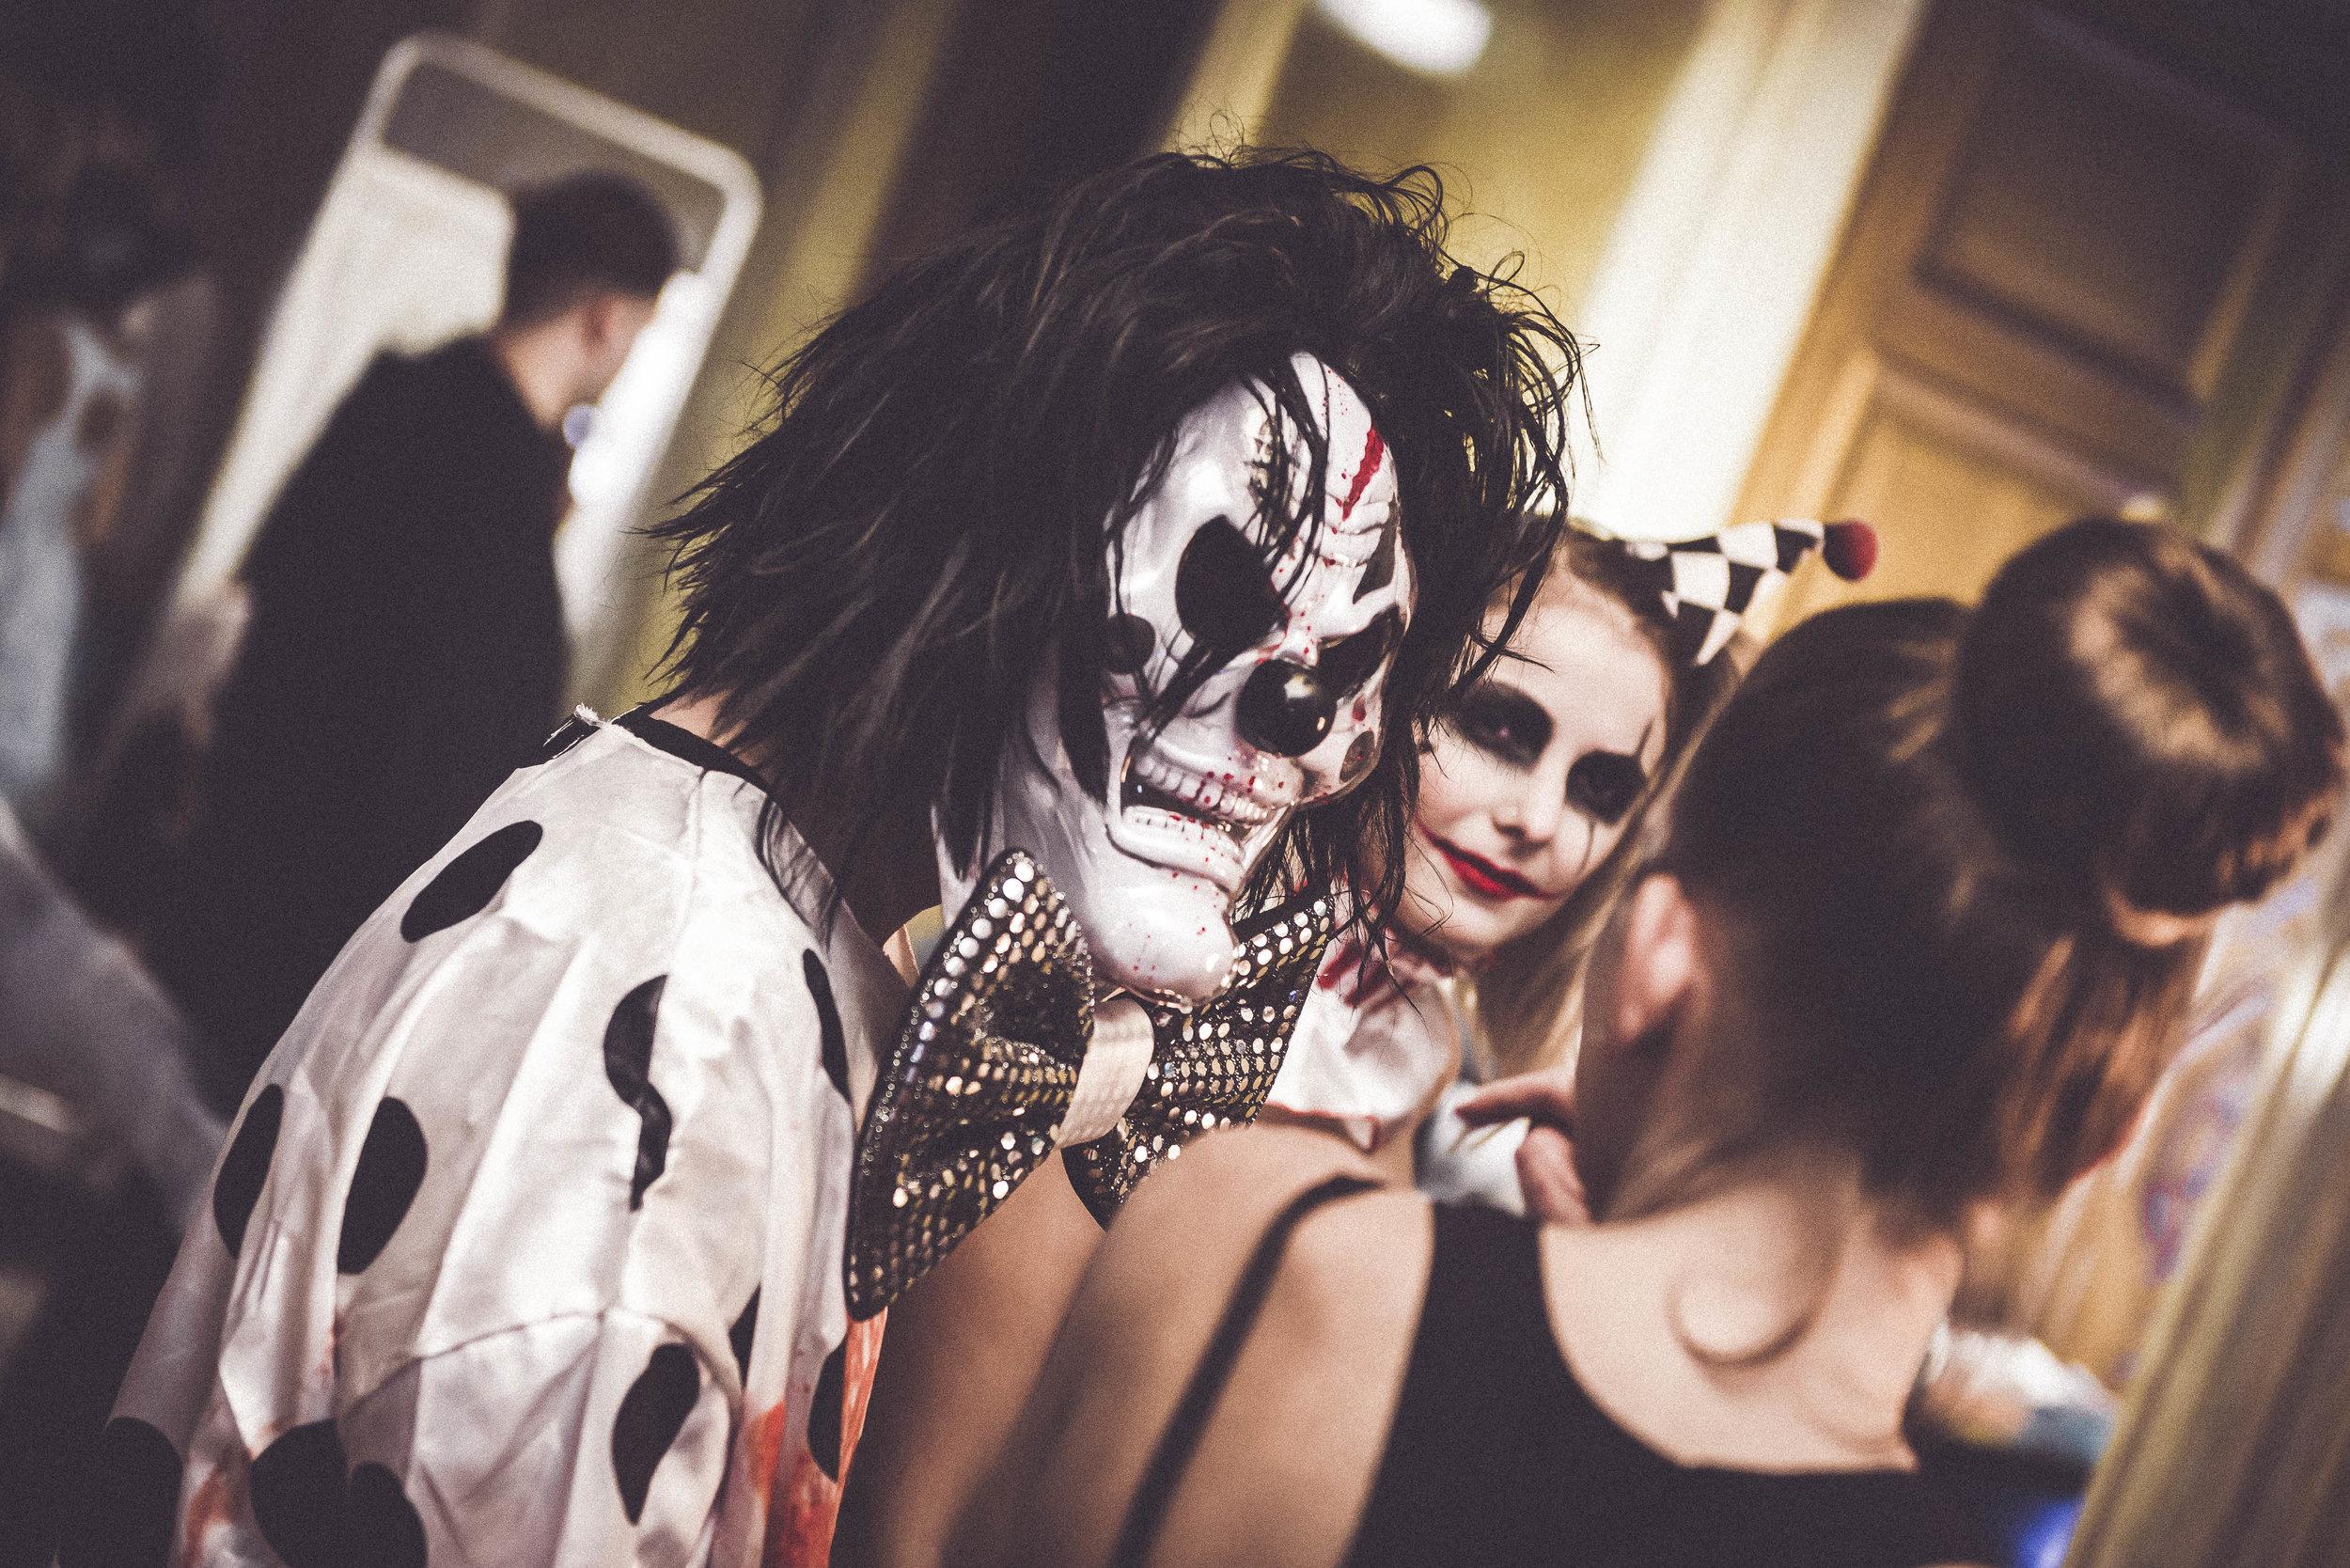 WSI_Halloweenball_0105_20161031__BAS3557.jpg